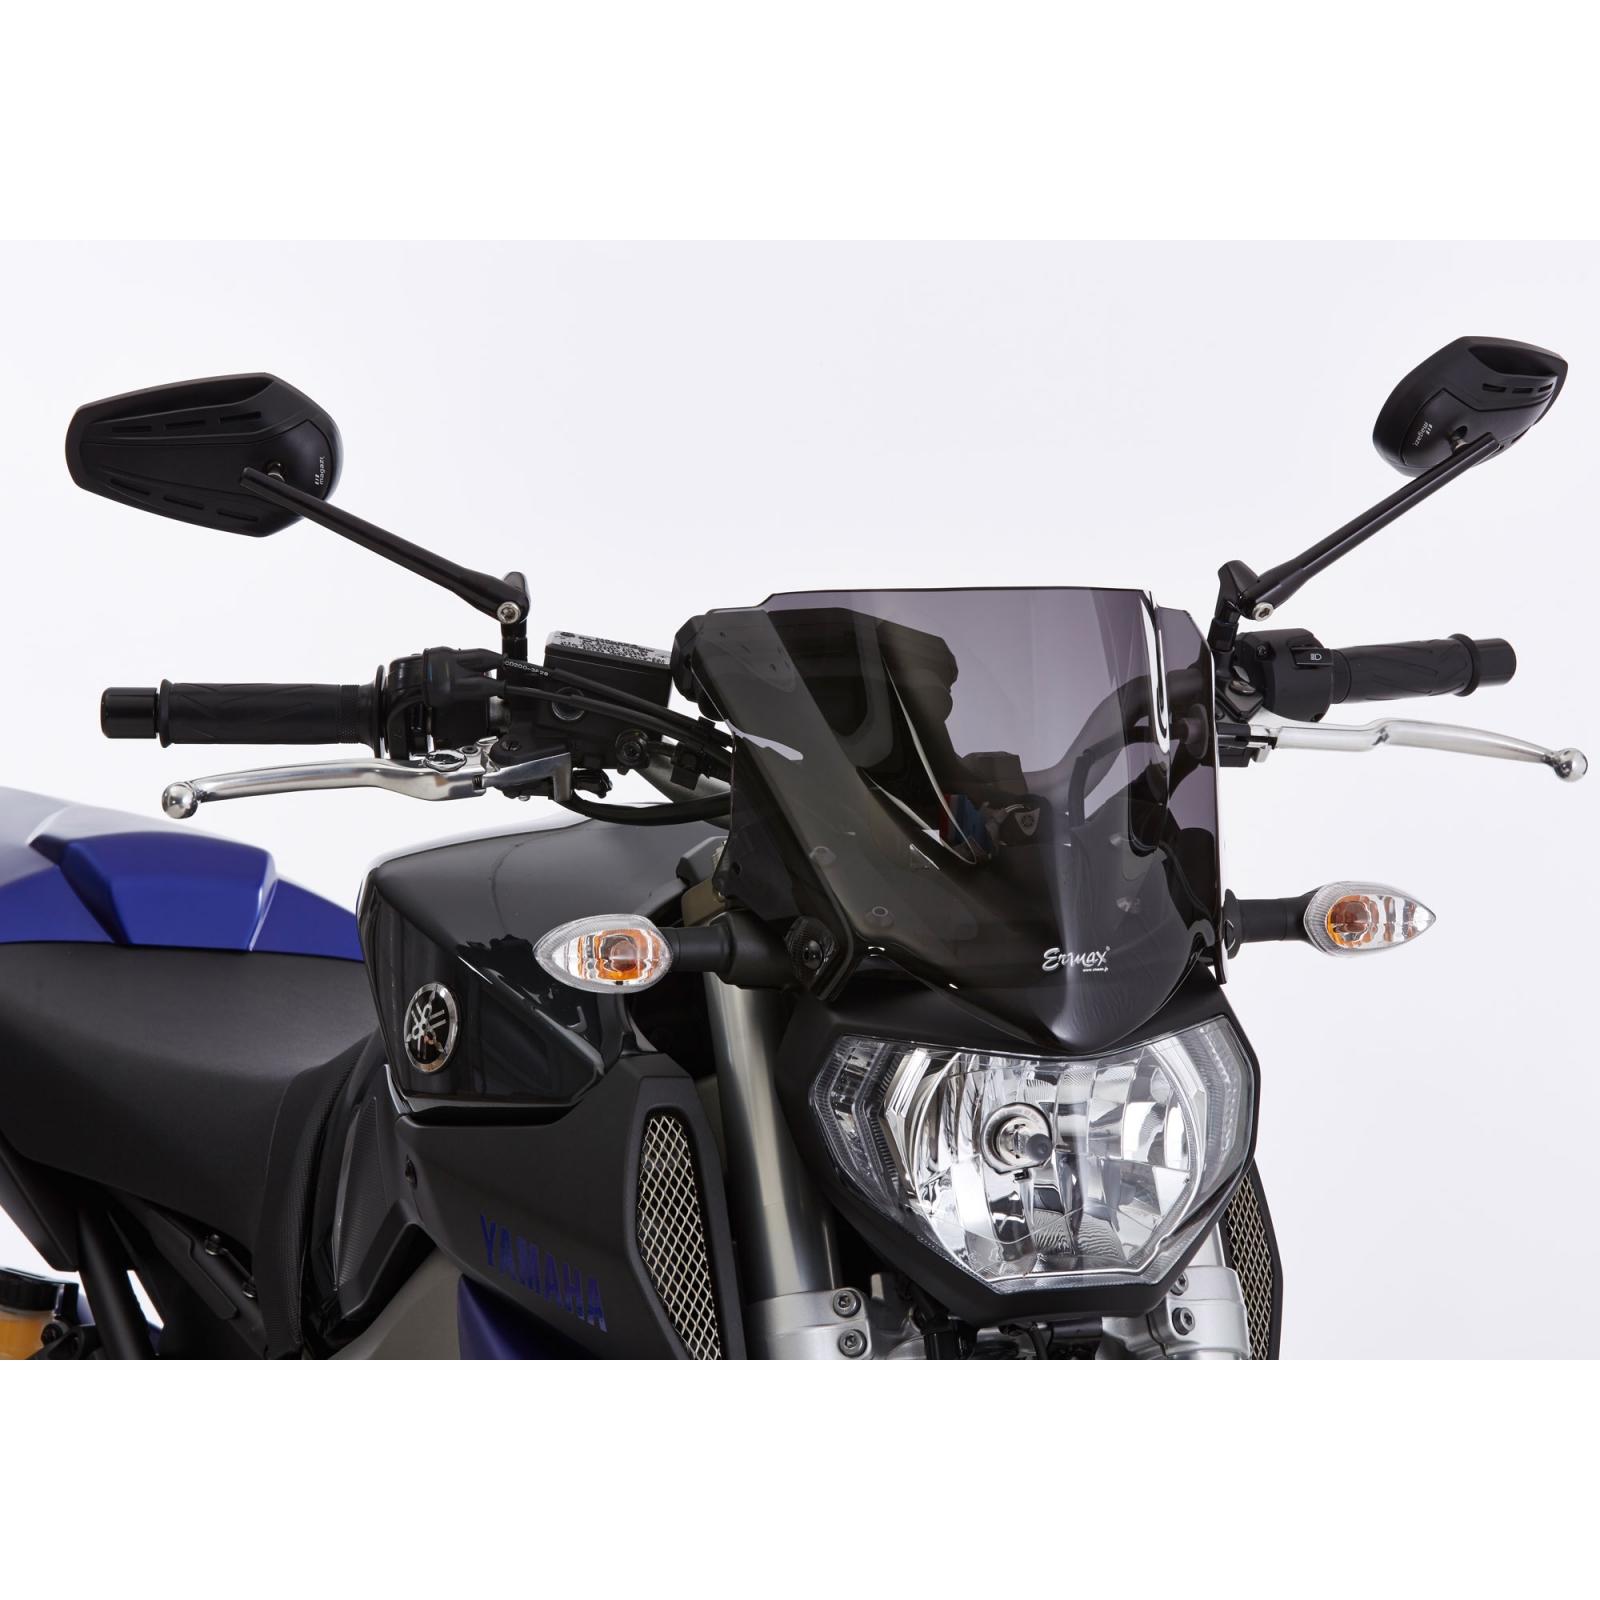 Pin en Yamaha MT-09 / MT09 / FZ09 / Naked Bikes